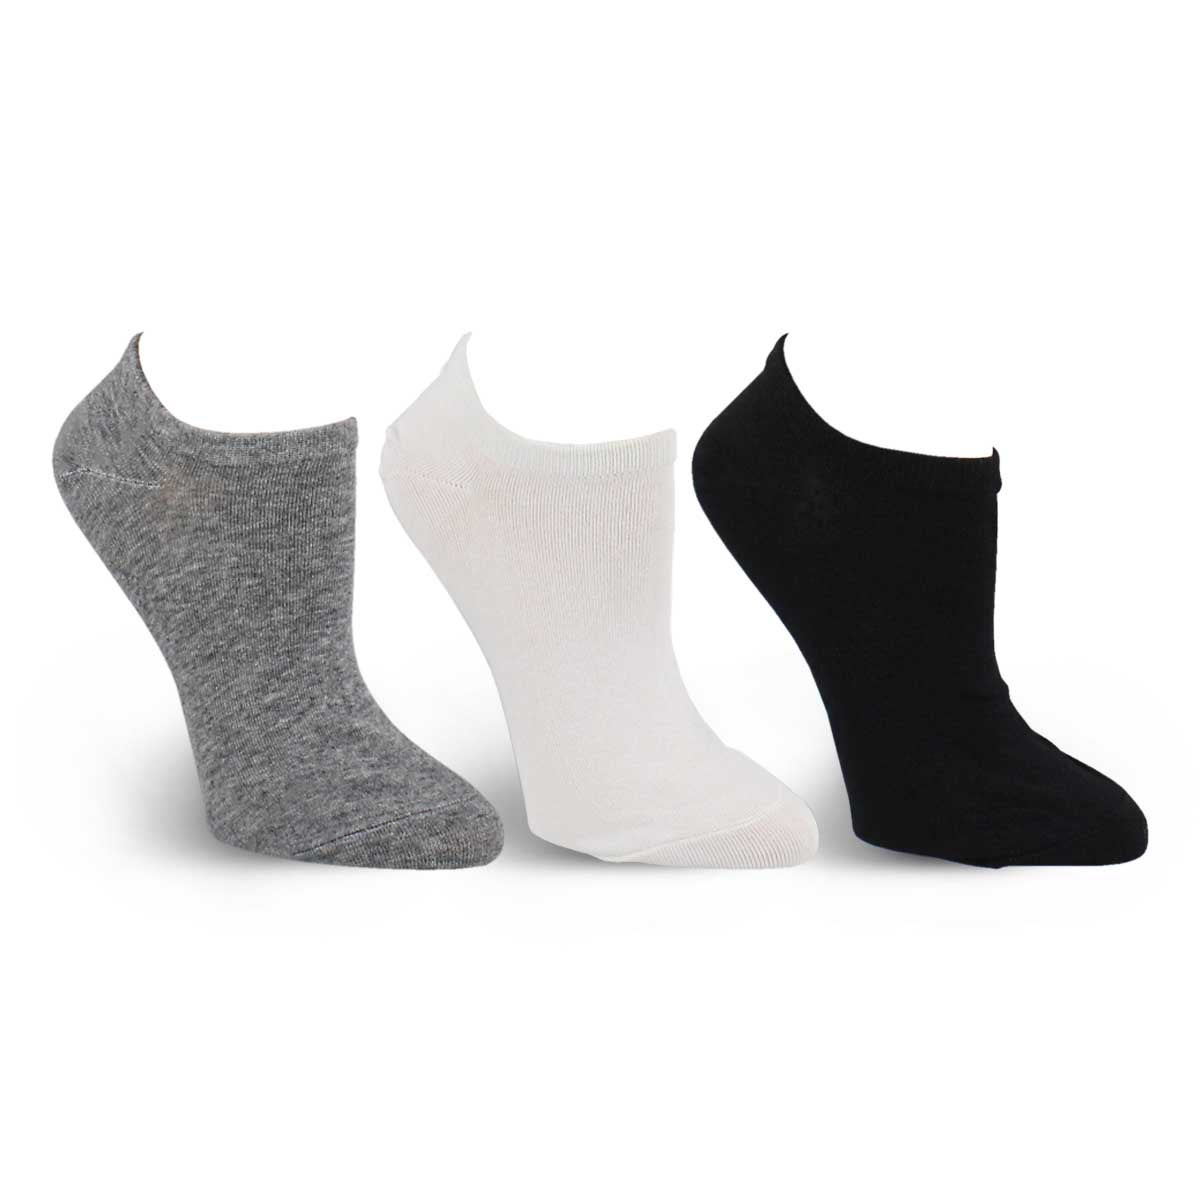 Mini socquettes CONVERSE, assorti, 3p, femmes